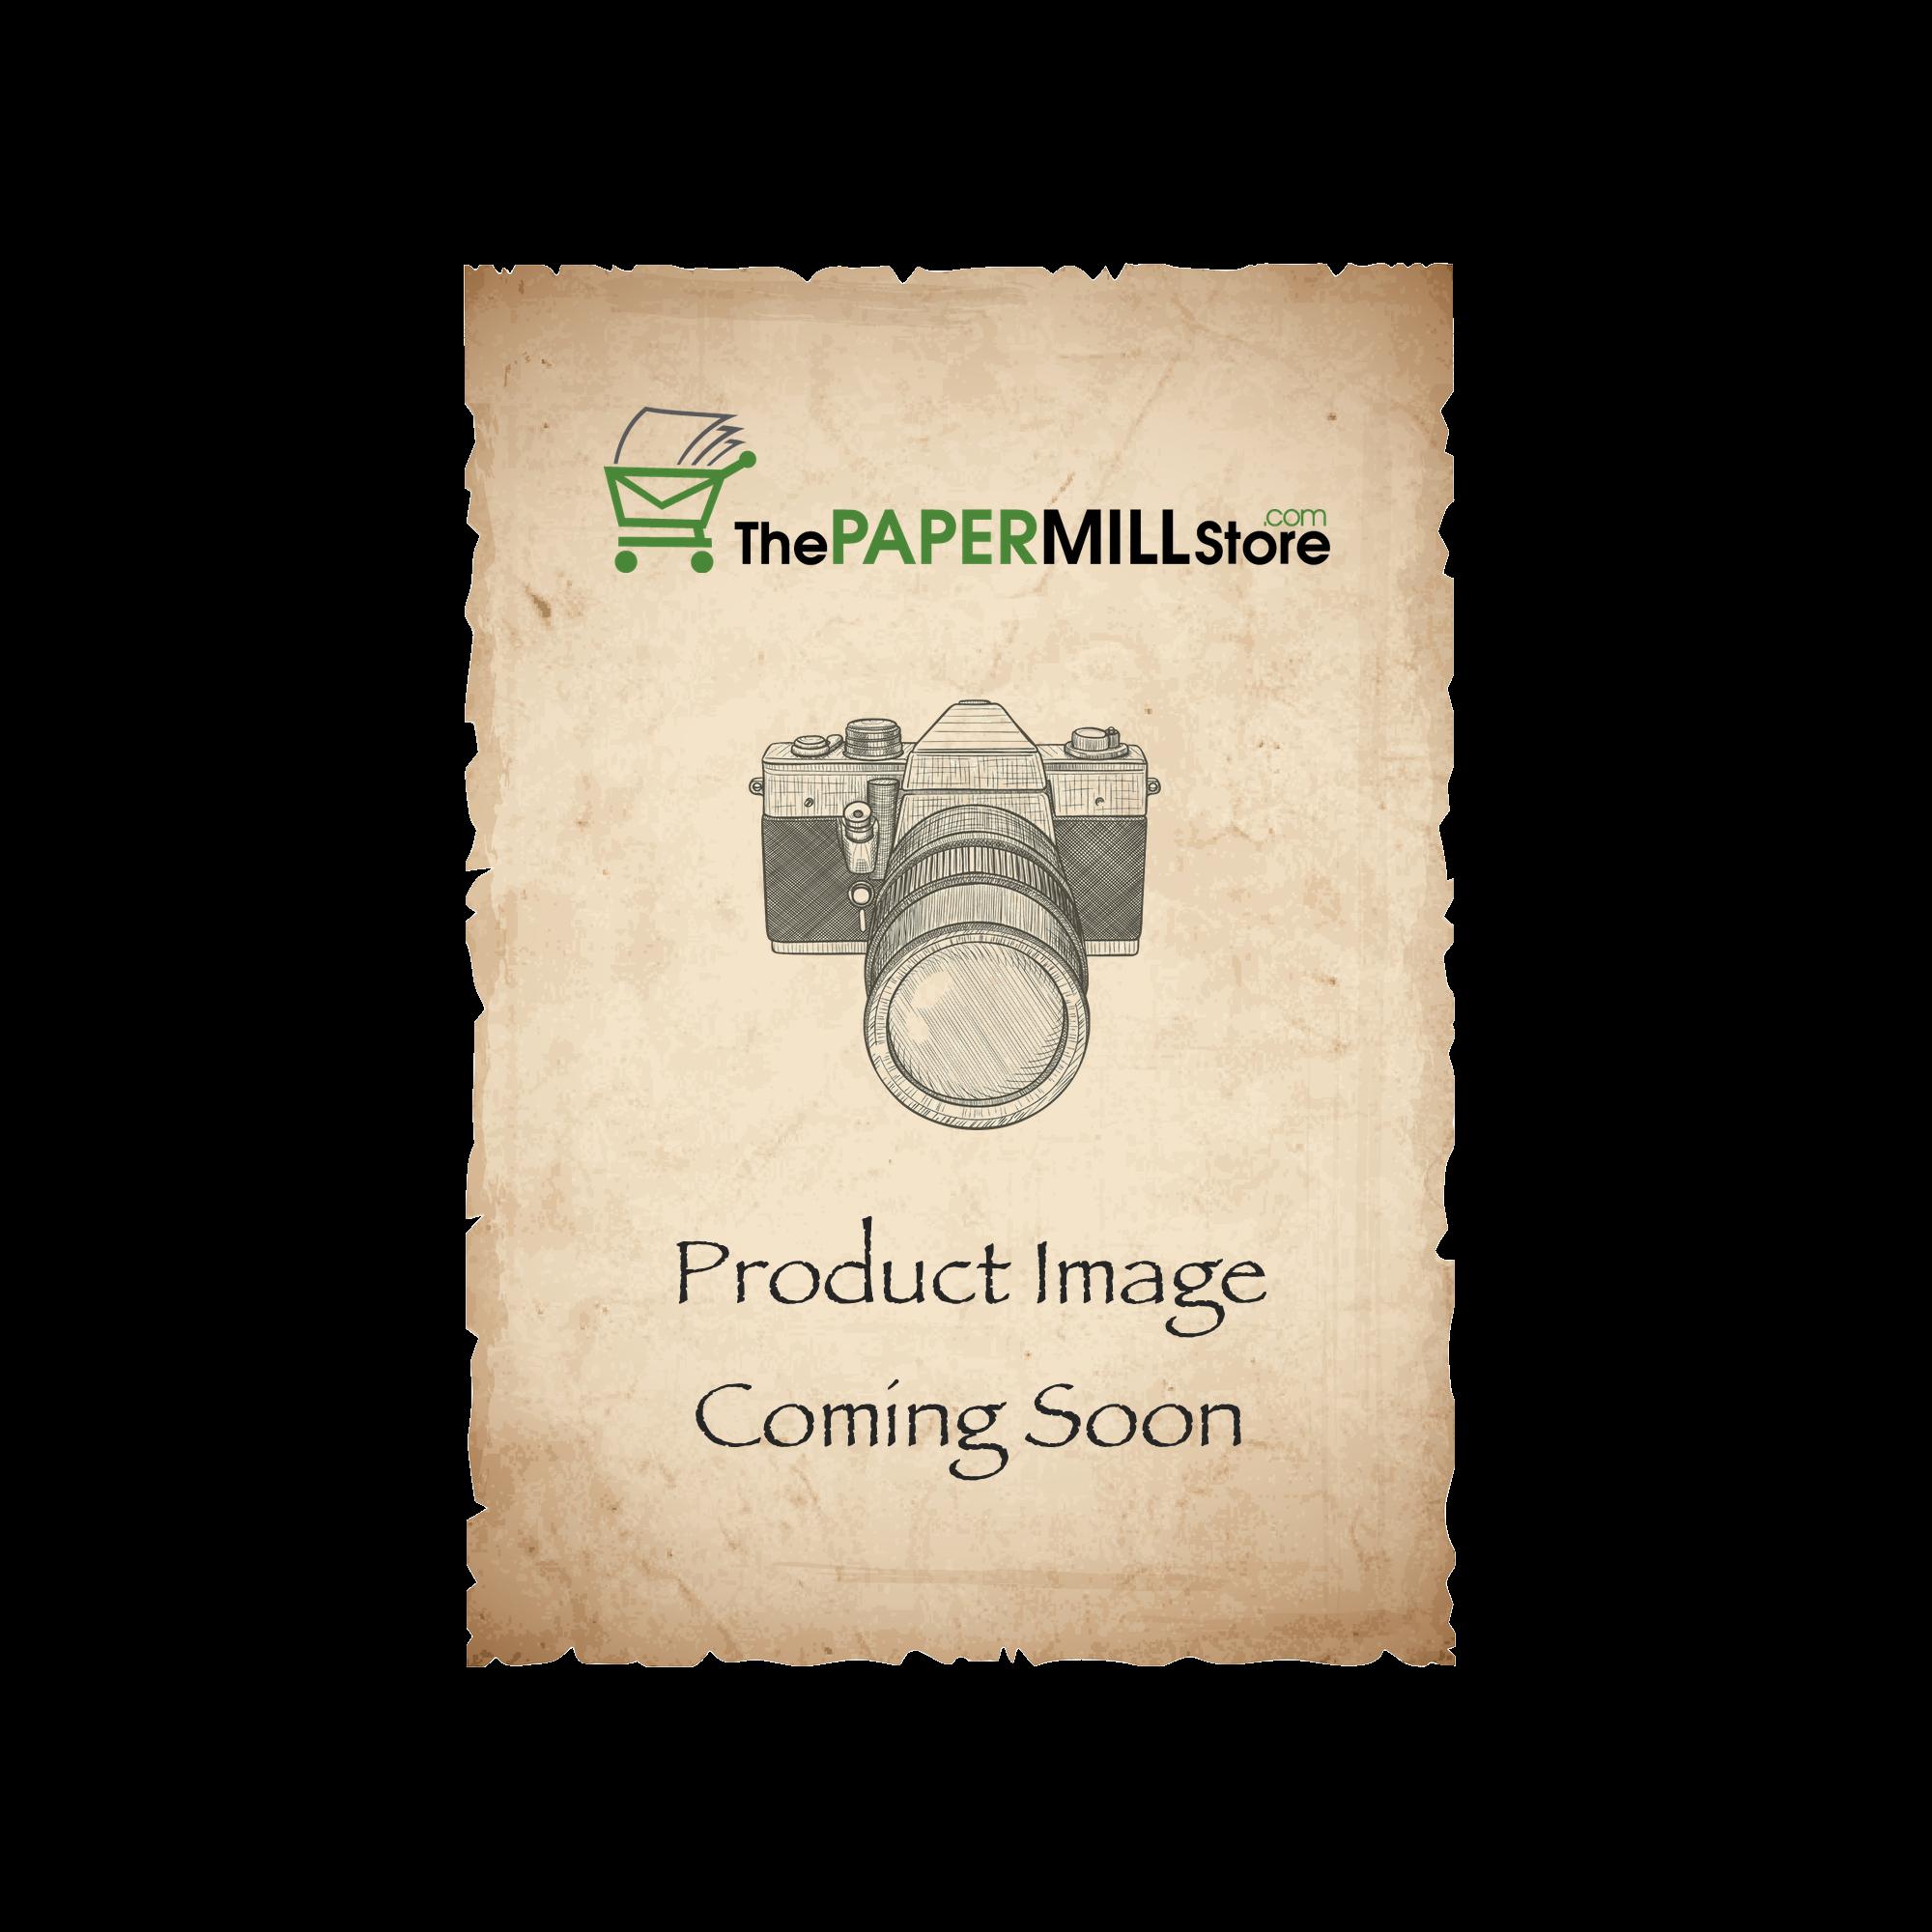 Ultrafelt Dove Gray Envelopes - A2 (4 3/8 x 5 3/4) 80 lb Text Premium Felt  30% Recycled 250 per Box